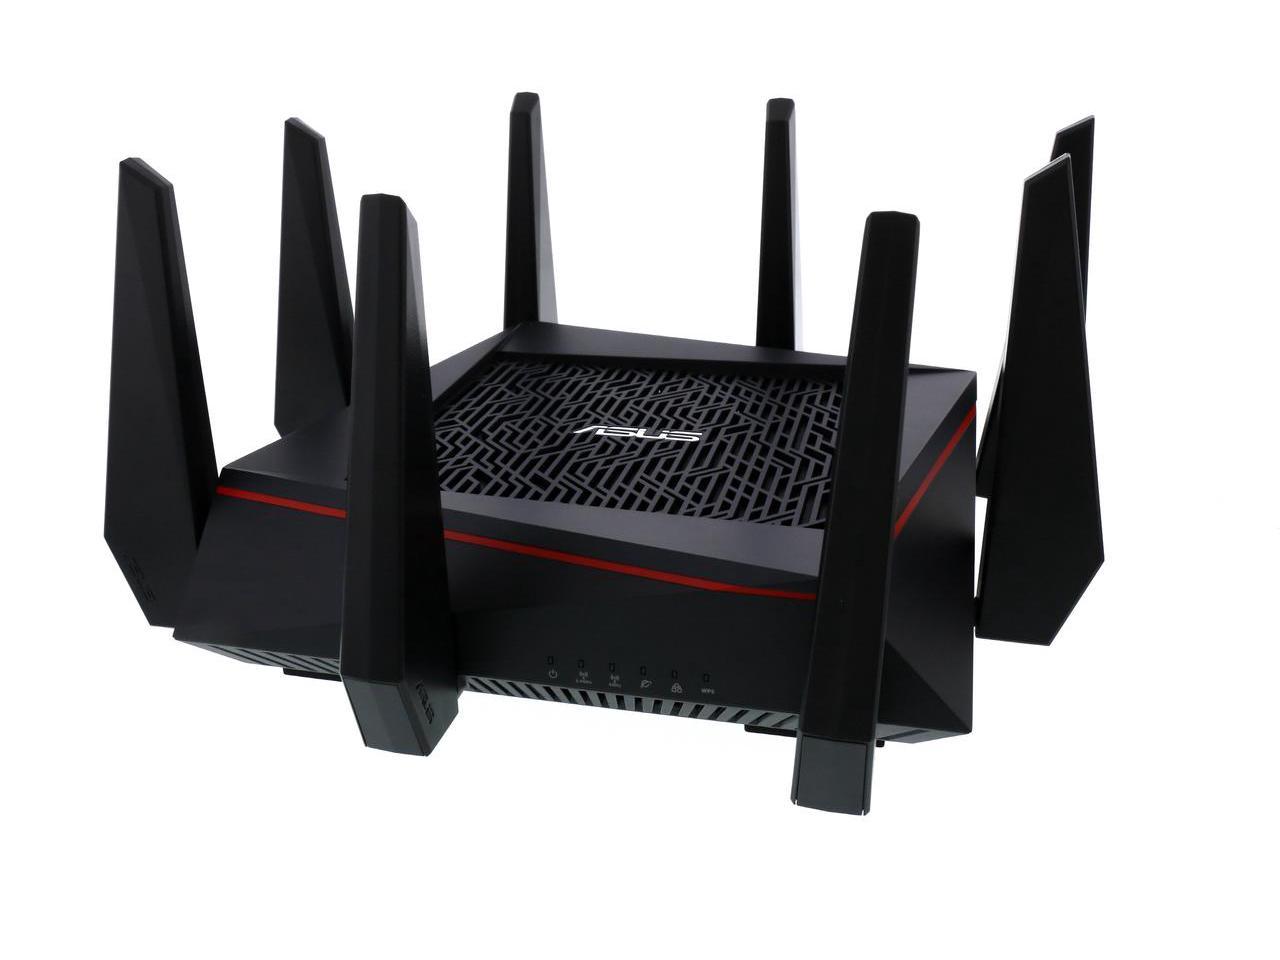 NEW ASUS RT-AC5300 Wireless AC5300 Tri-Band Gigabit Router $250 @newegg